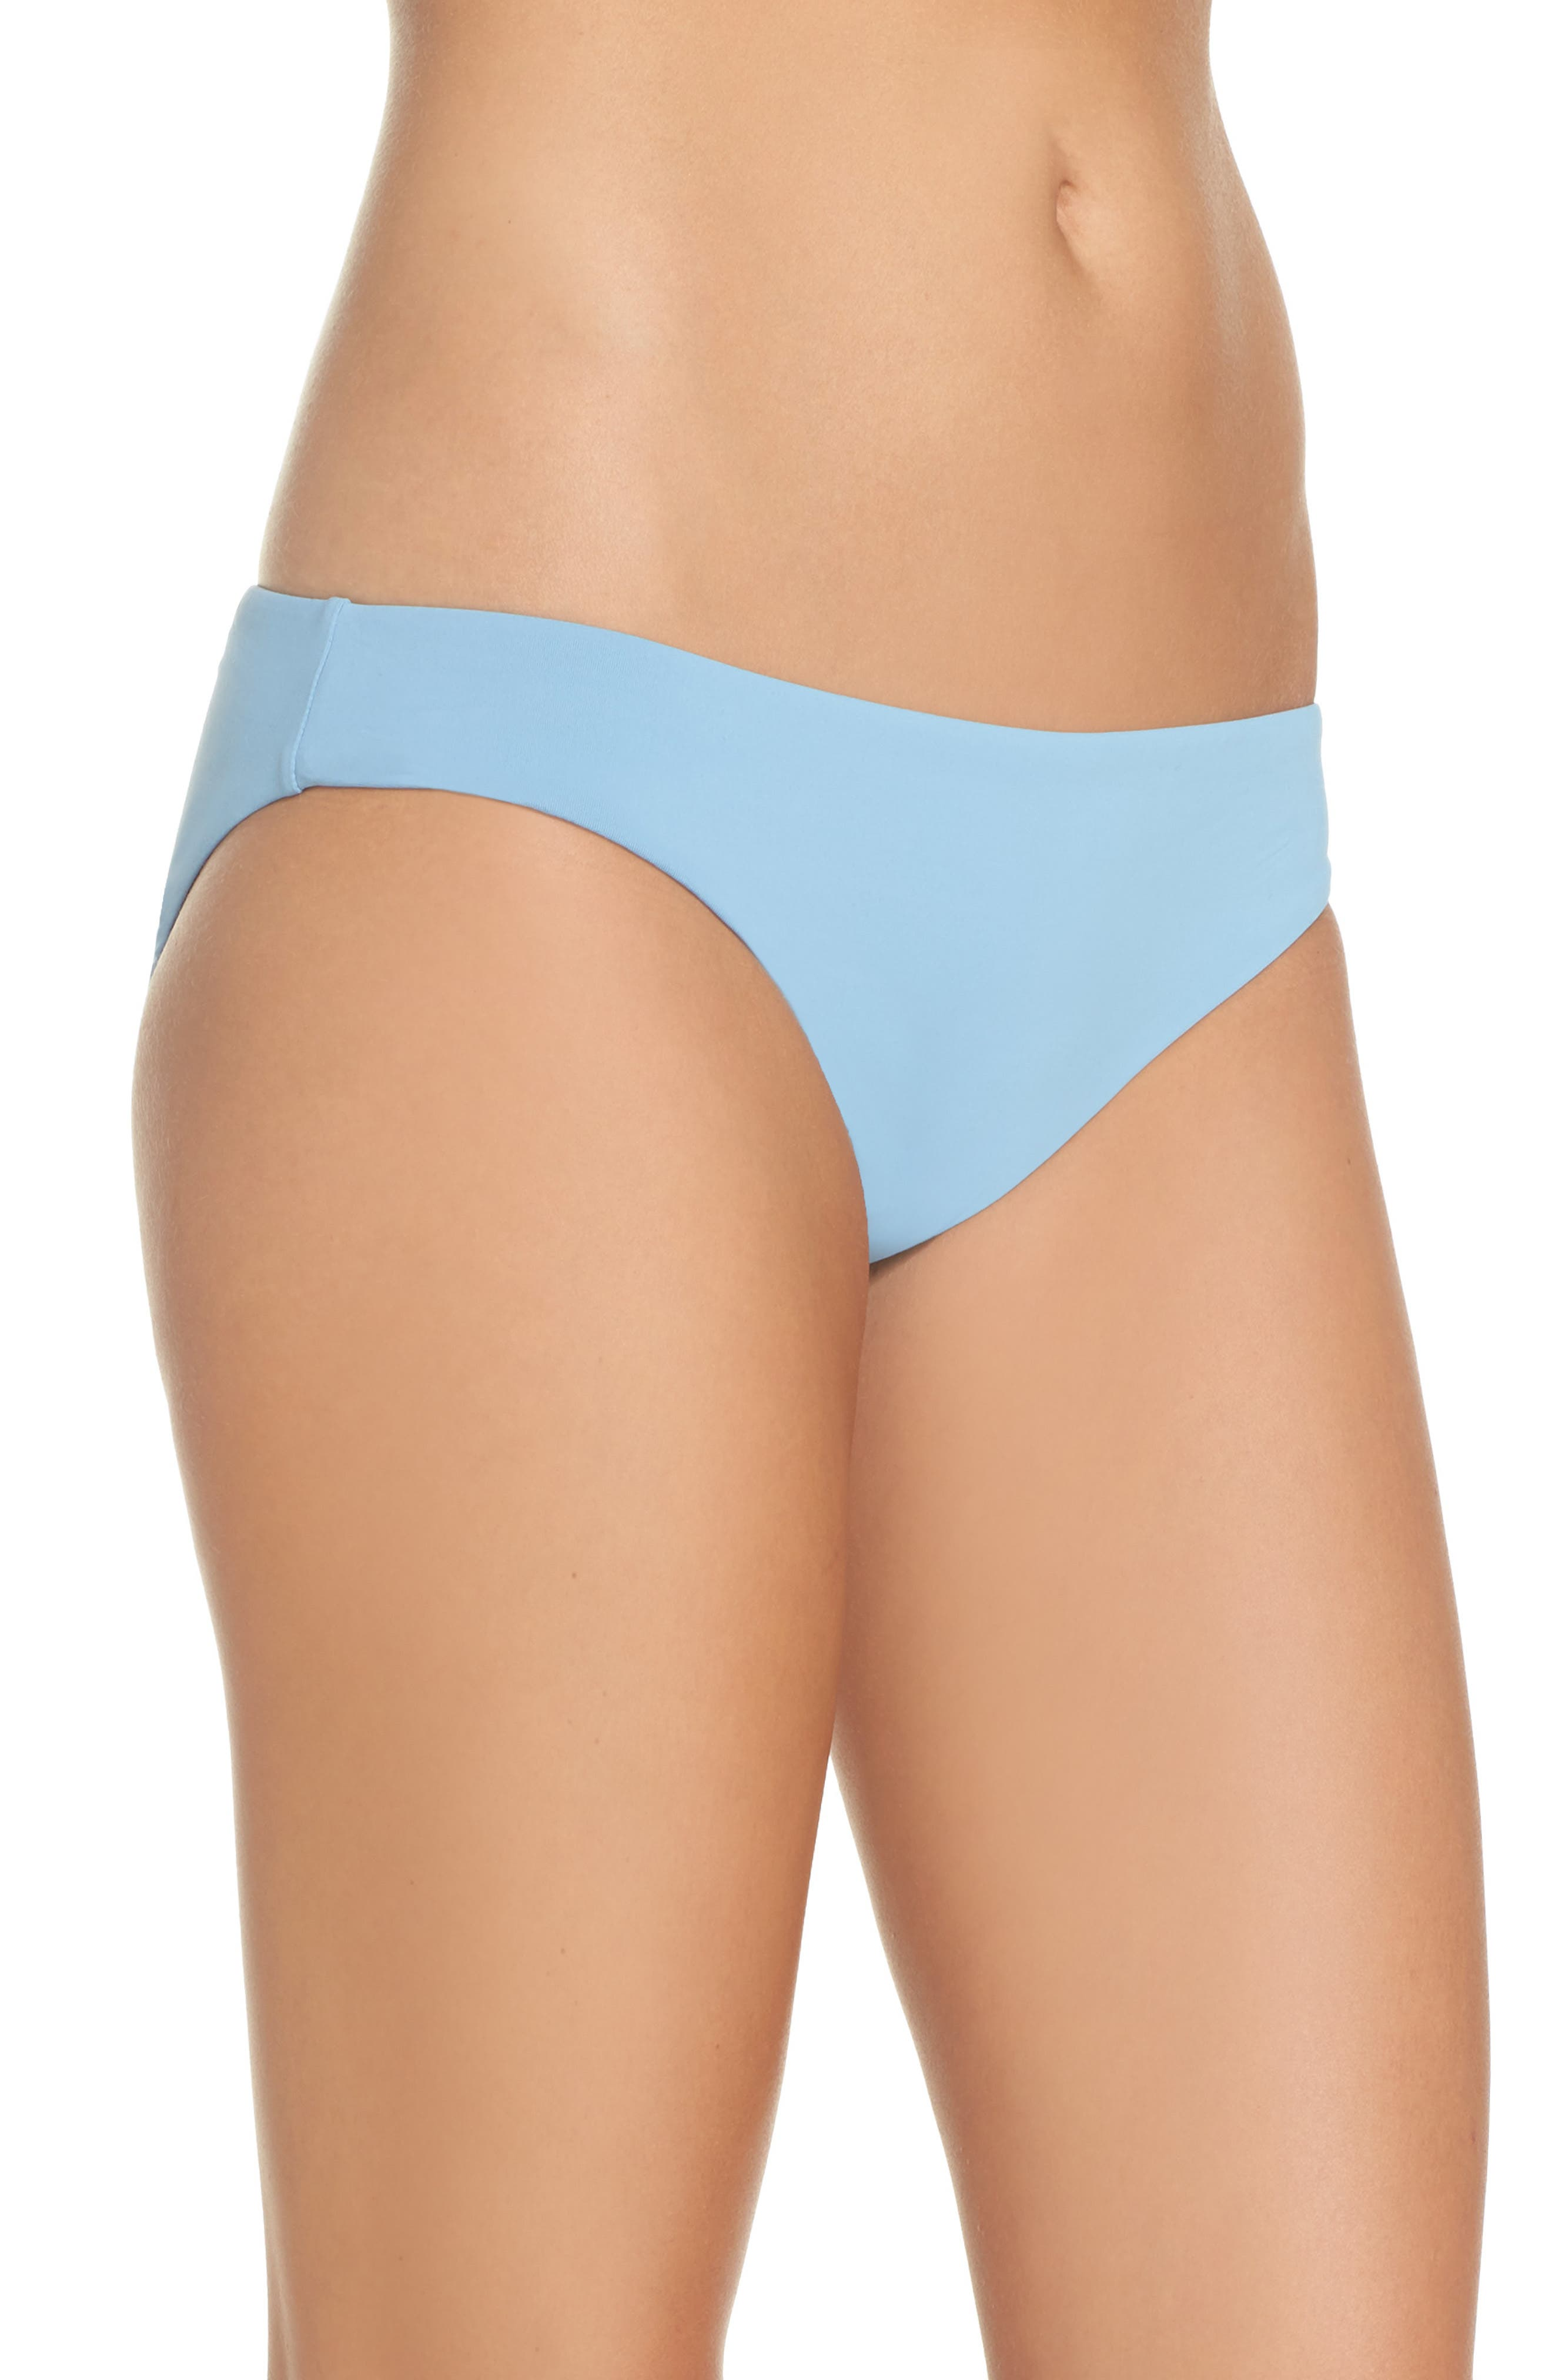 Active Bikini Bottoms,                             Alternate thumbnail 3, color,                             Blue Mist